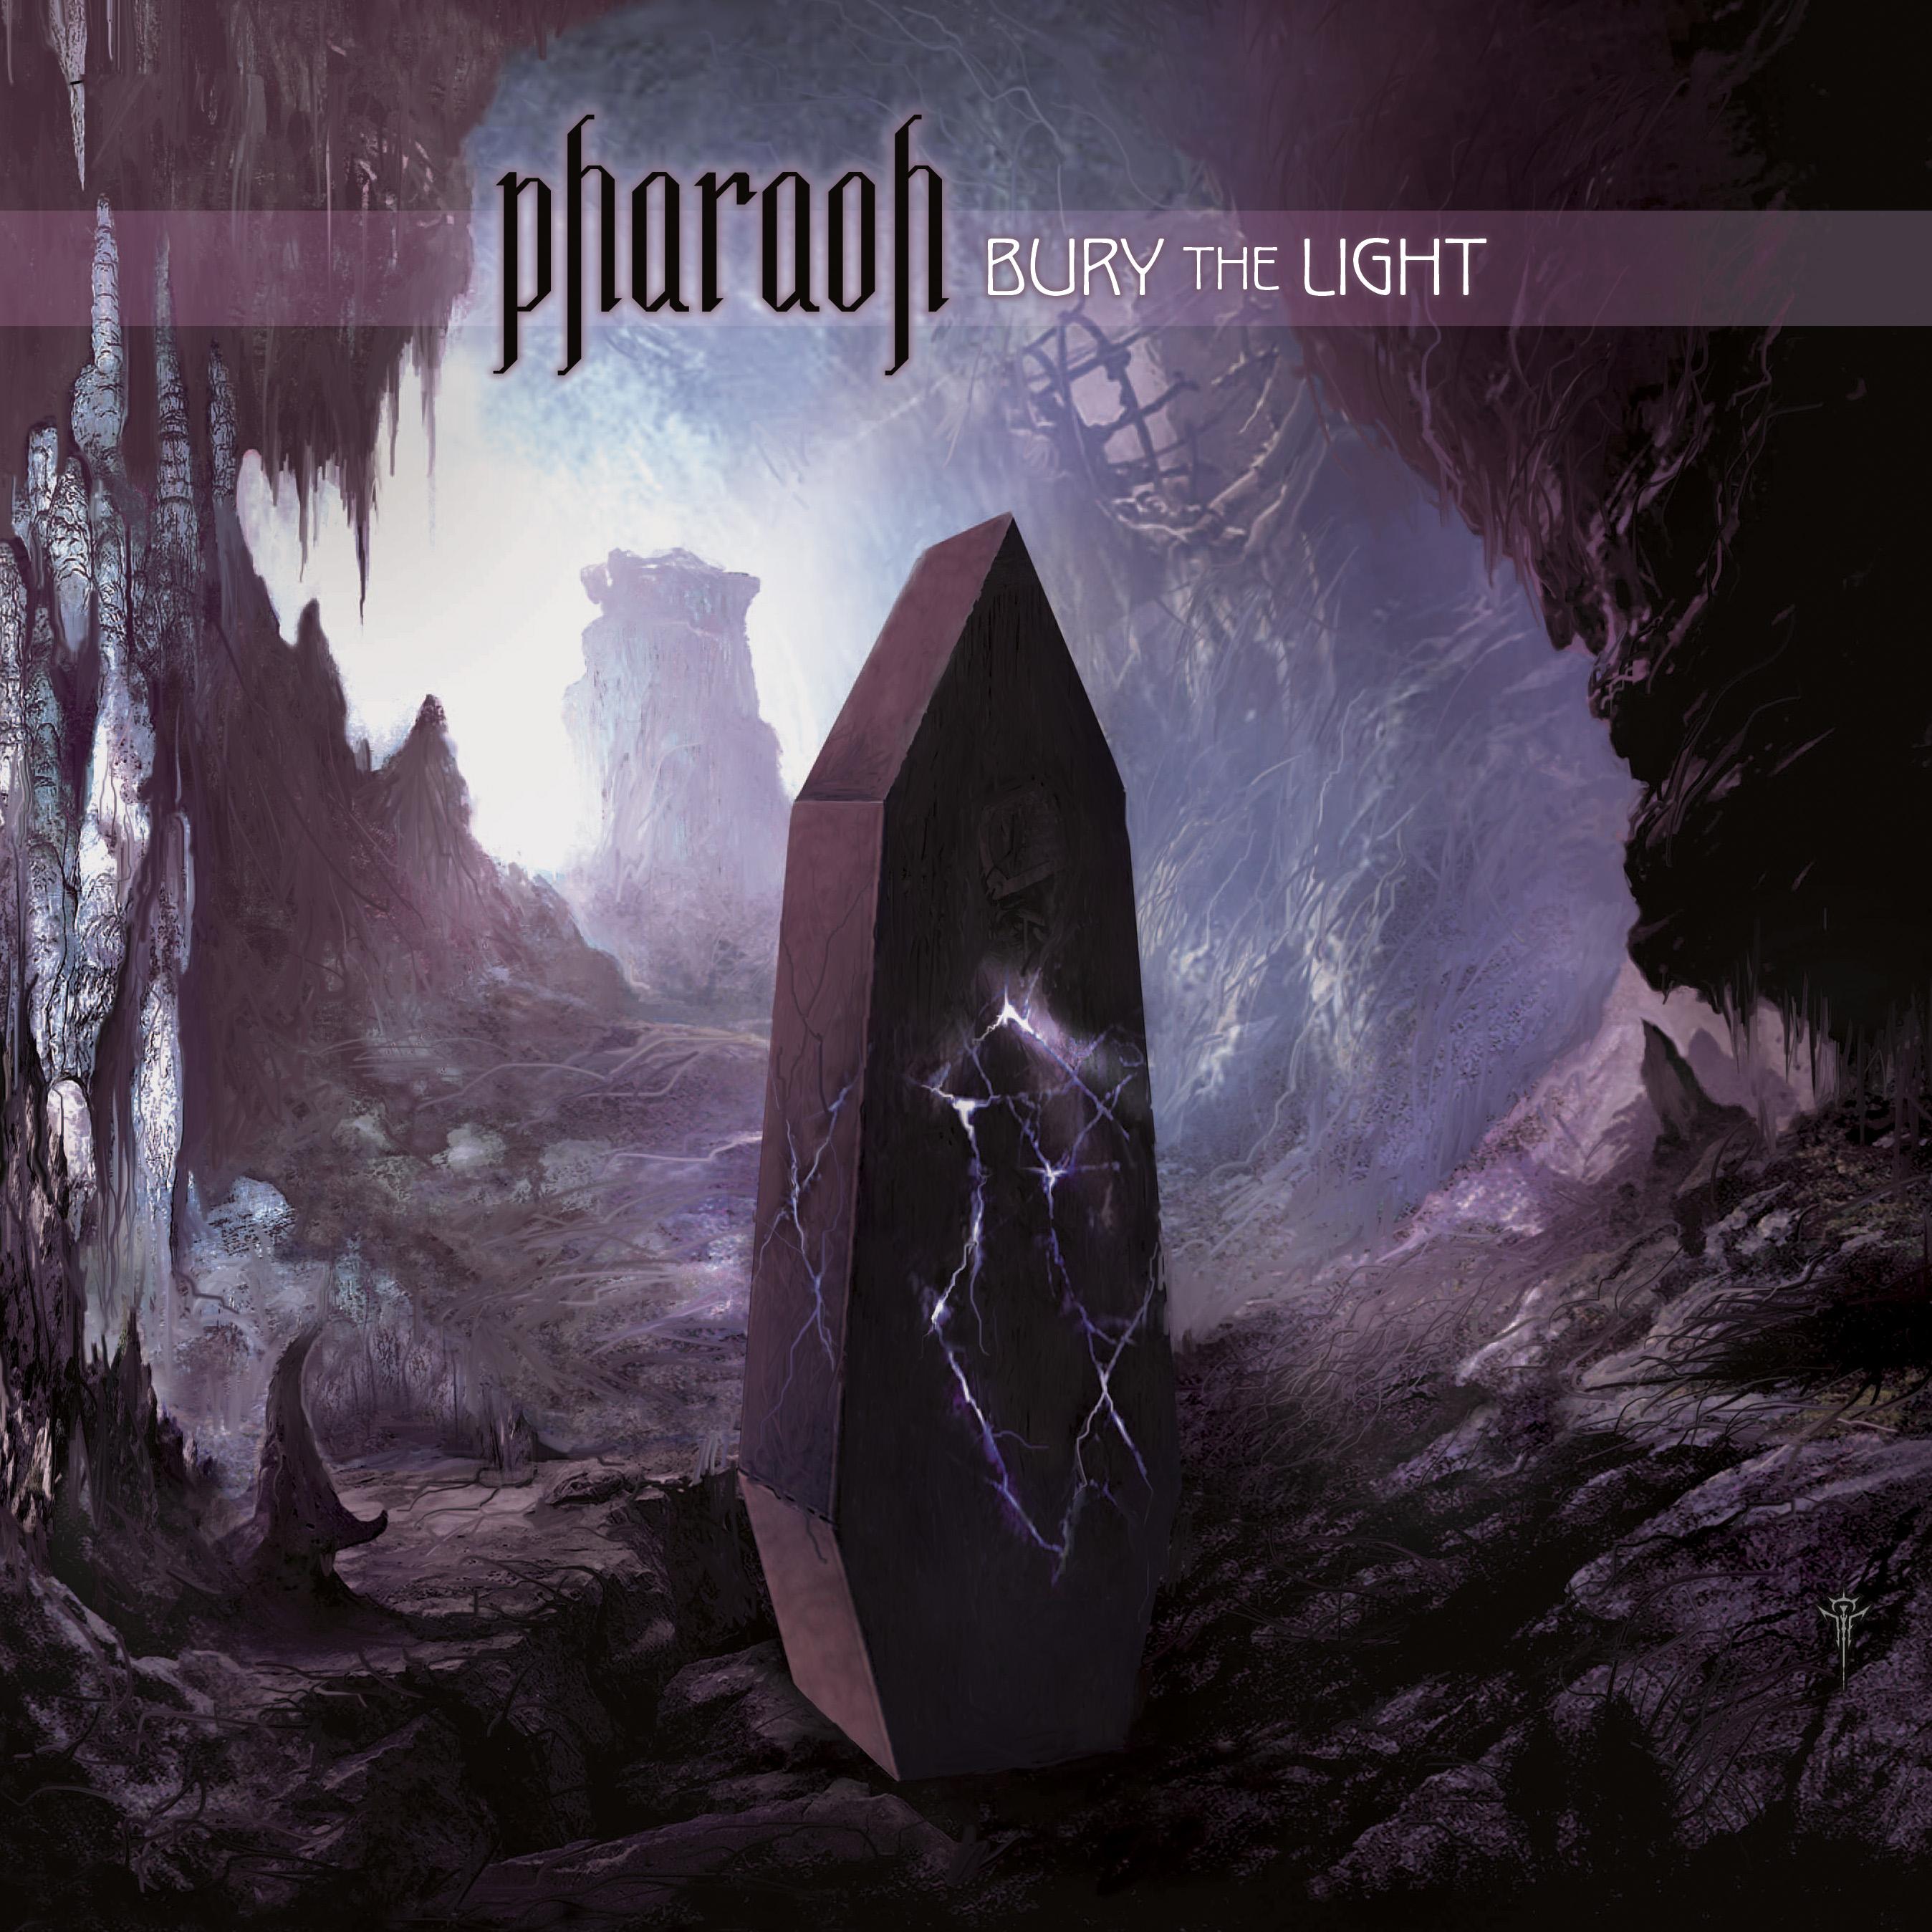 Pharaoh – Bury the Light Review